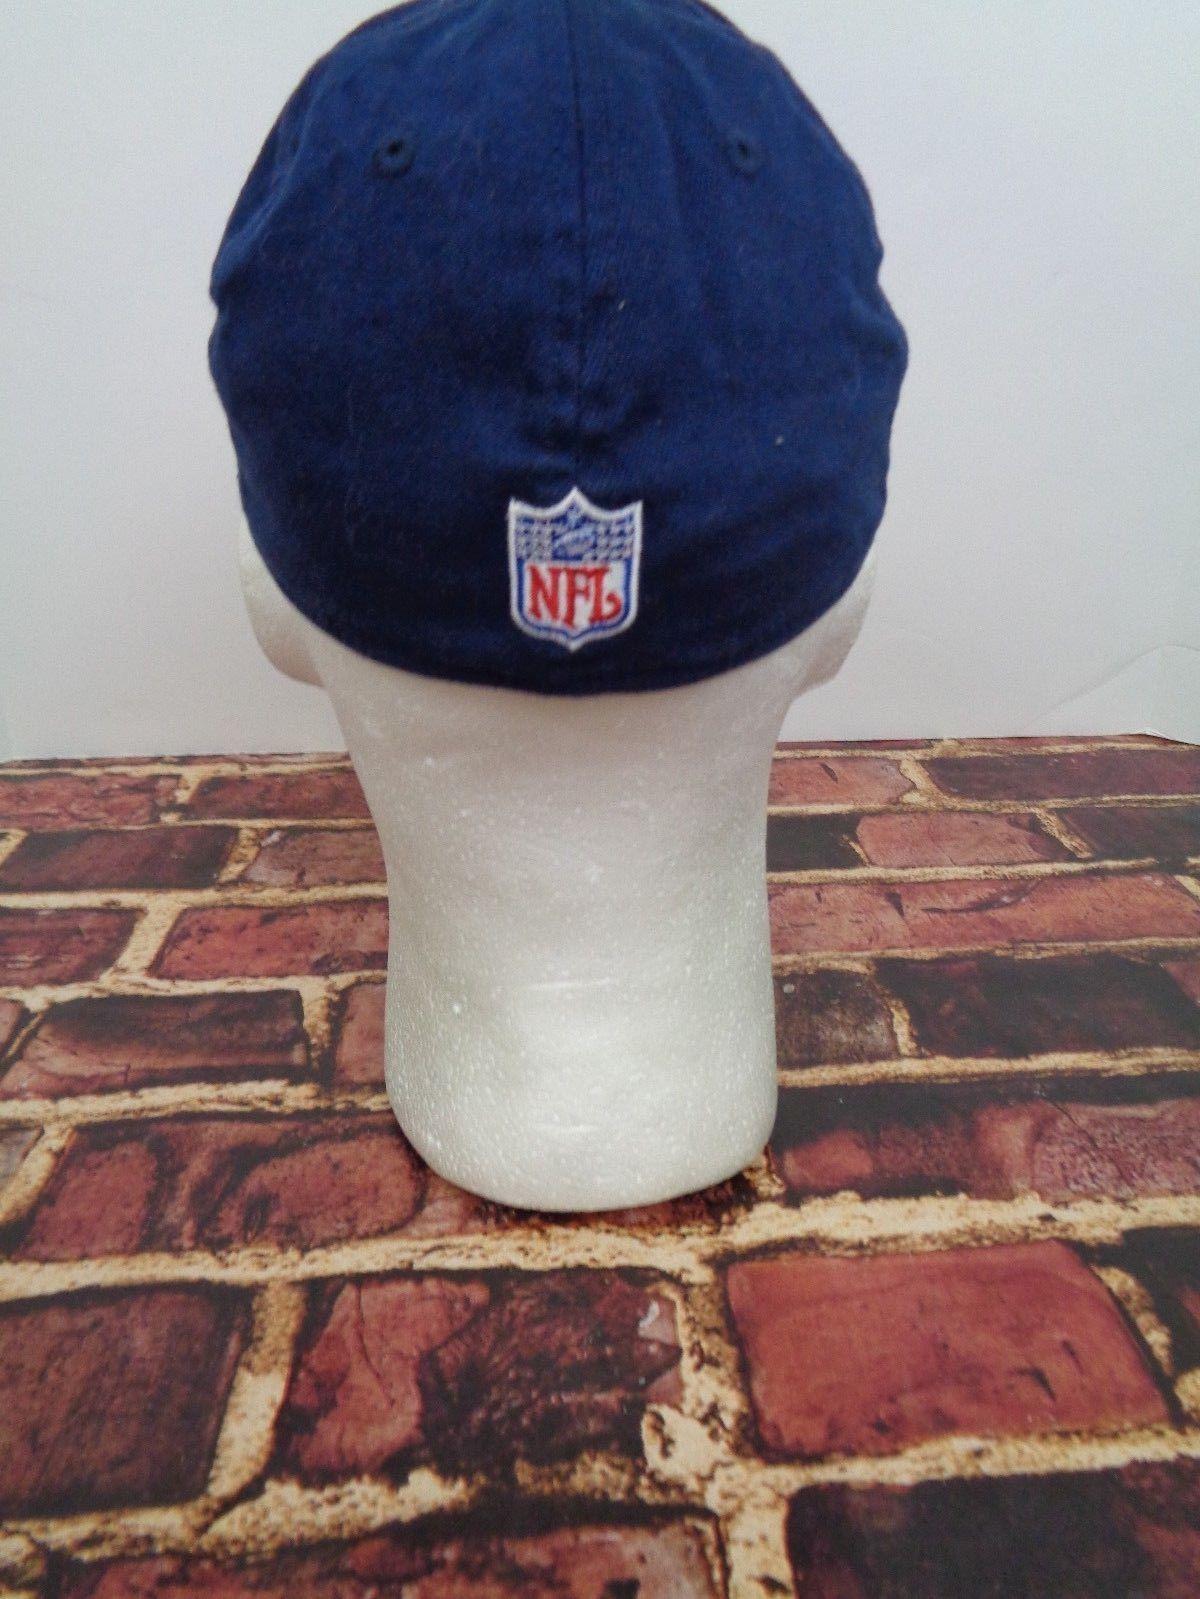 New England Patriots NFL Football Blue Hat Cap One Size Reebok Boston Brady